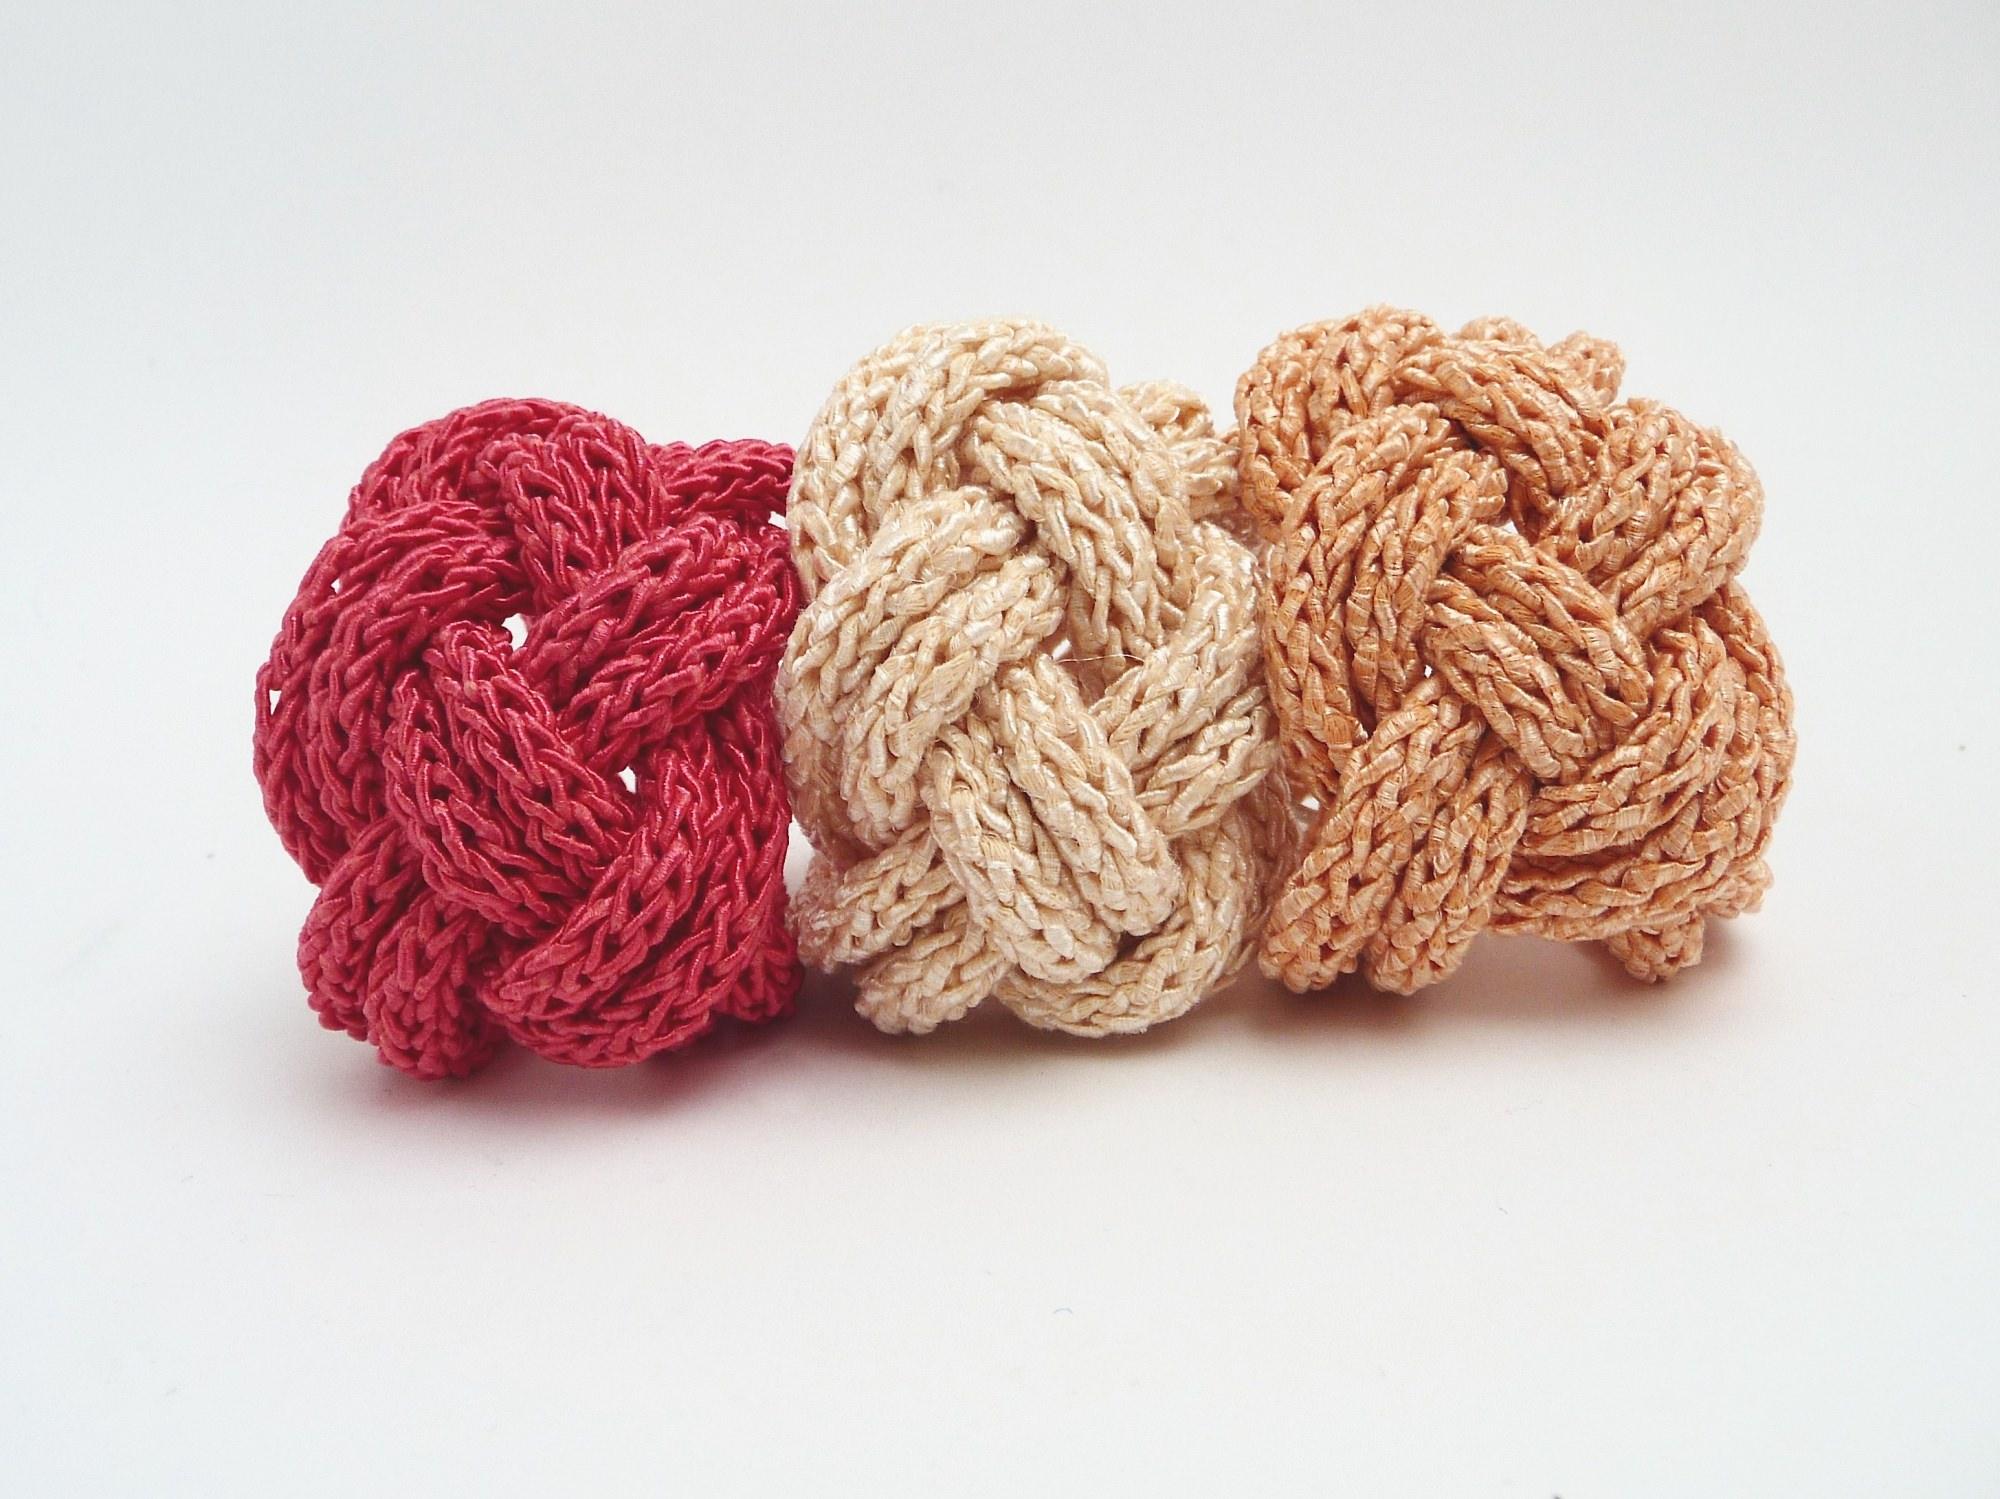 - Armband Lachs Keltischer Knoten Seide Cotton Strick Armband - Armband Lachs Keltischer Knoten Seide Cotton Strick Armband